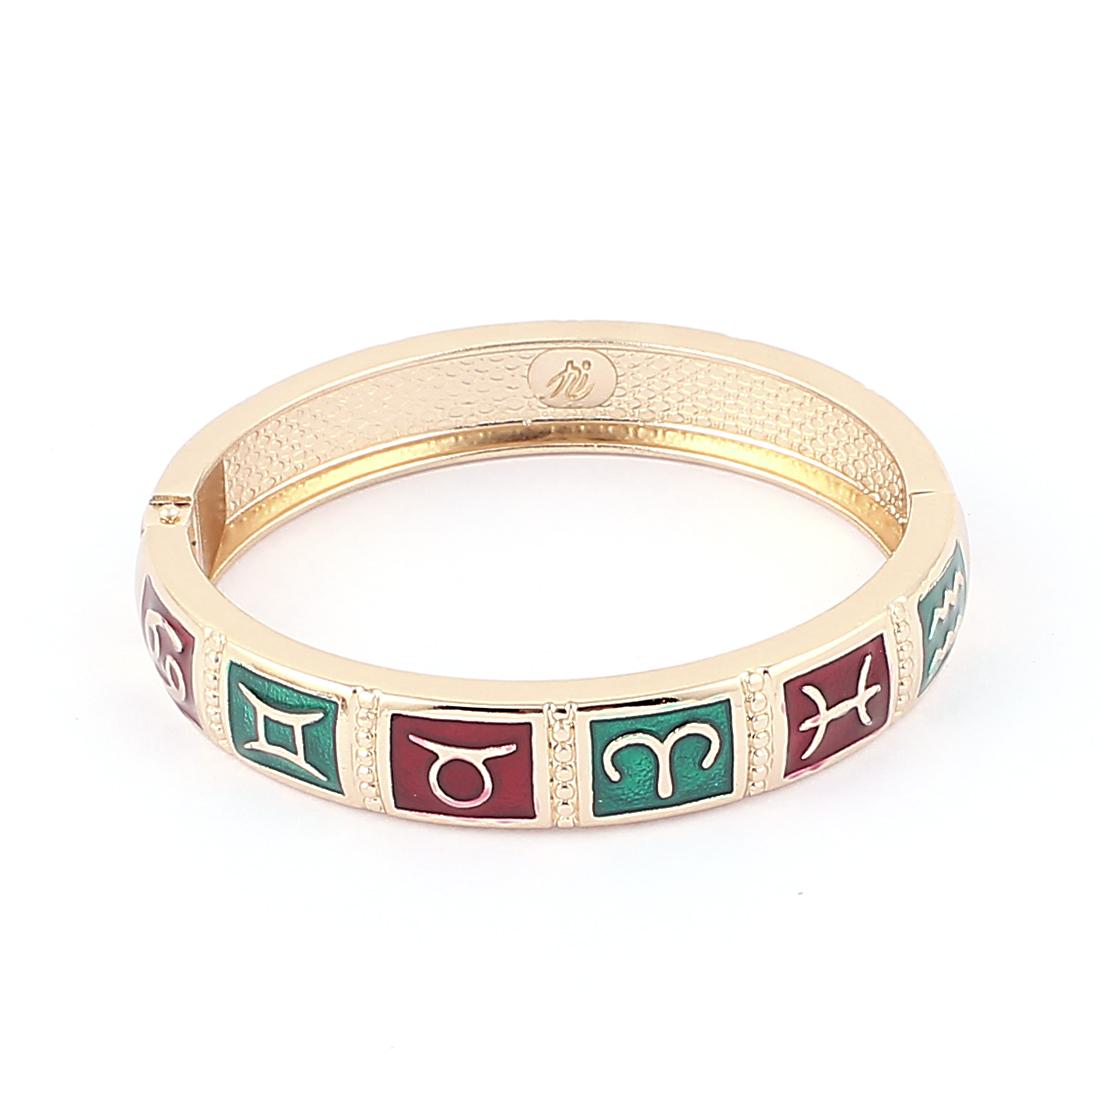 "Round Wrist Gold Tone Metal 12 Constellations Pattern Bracelet Enamel 0.4"" Width"